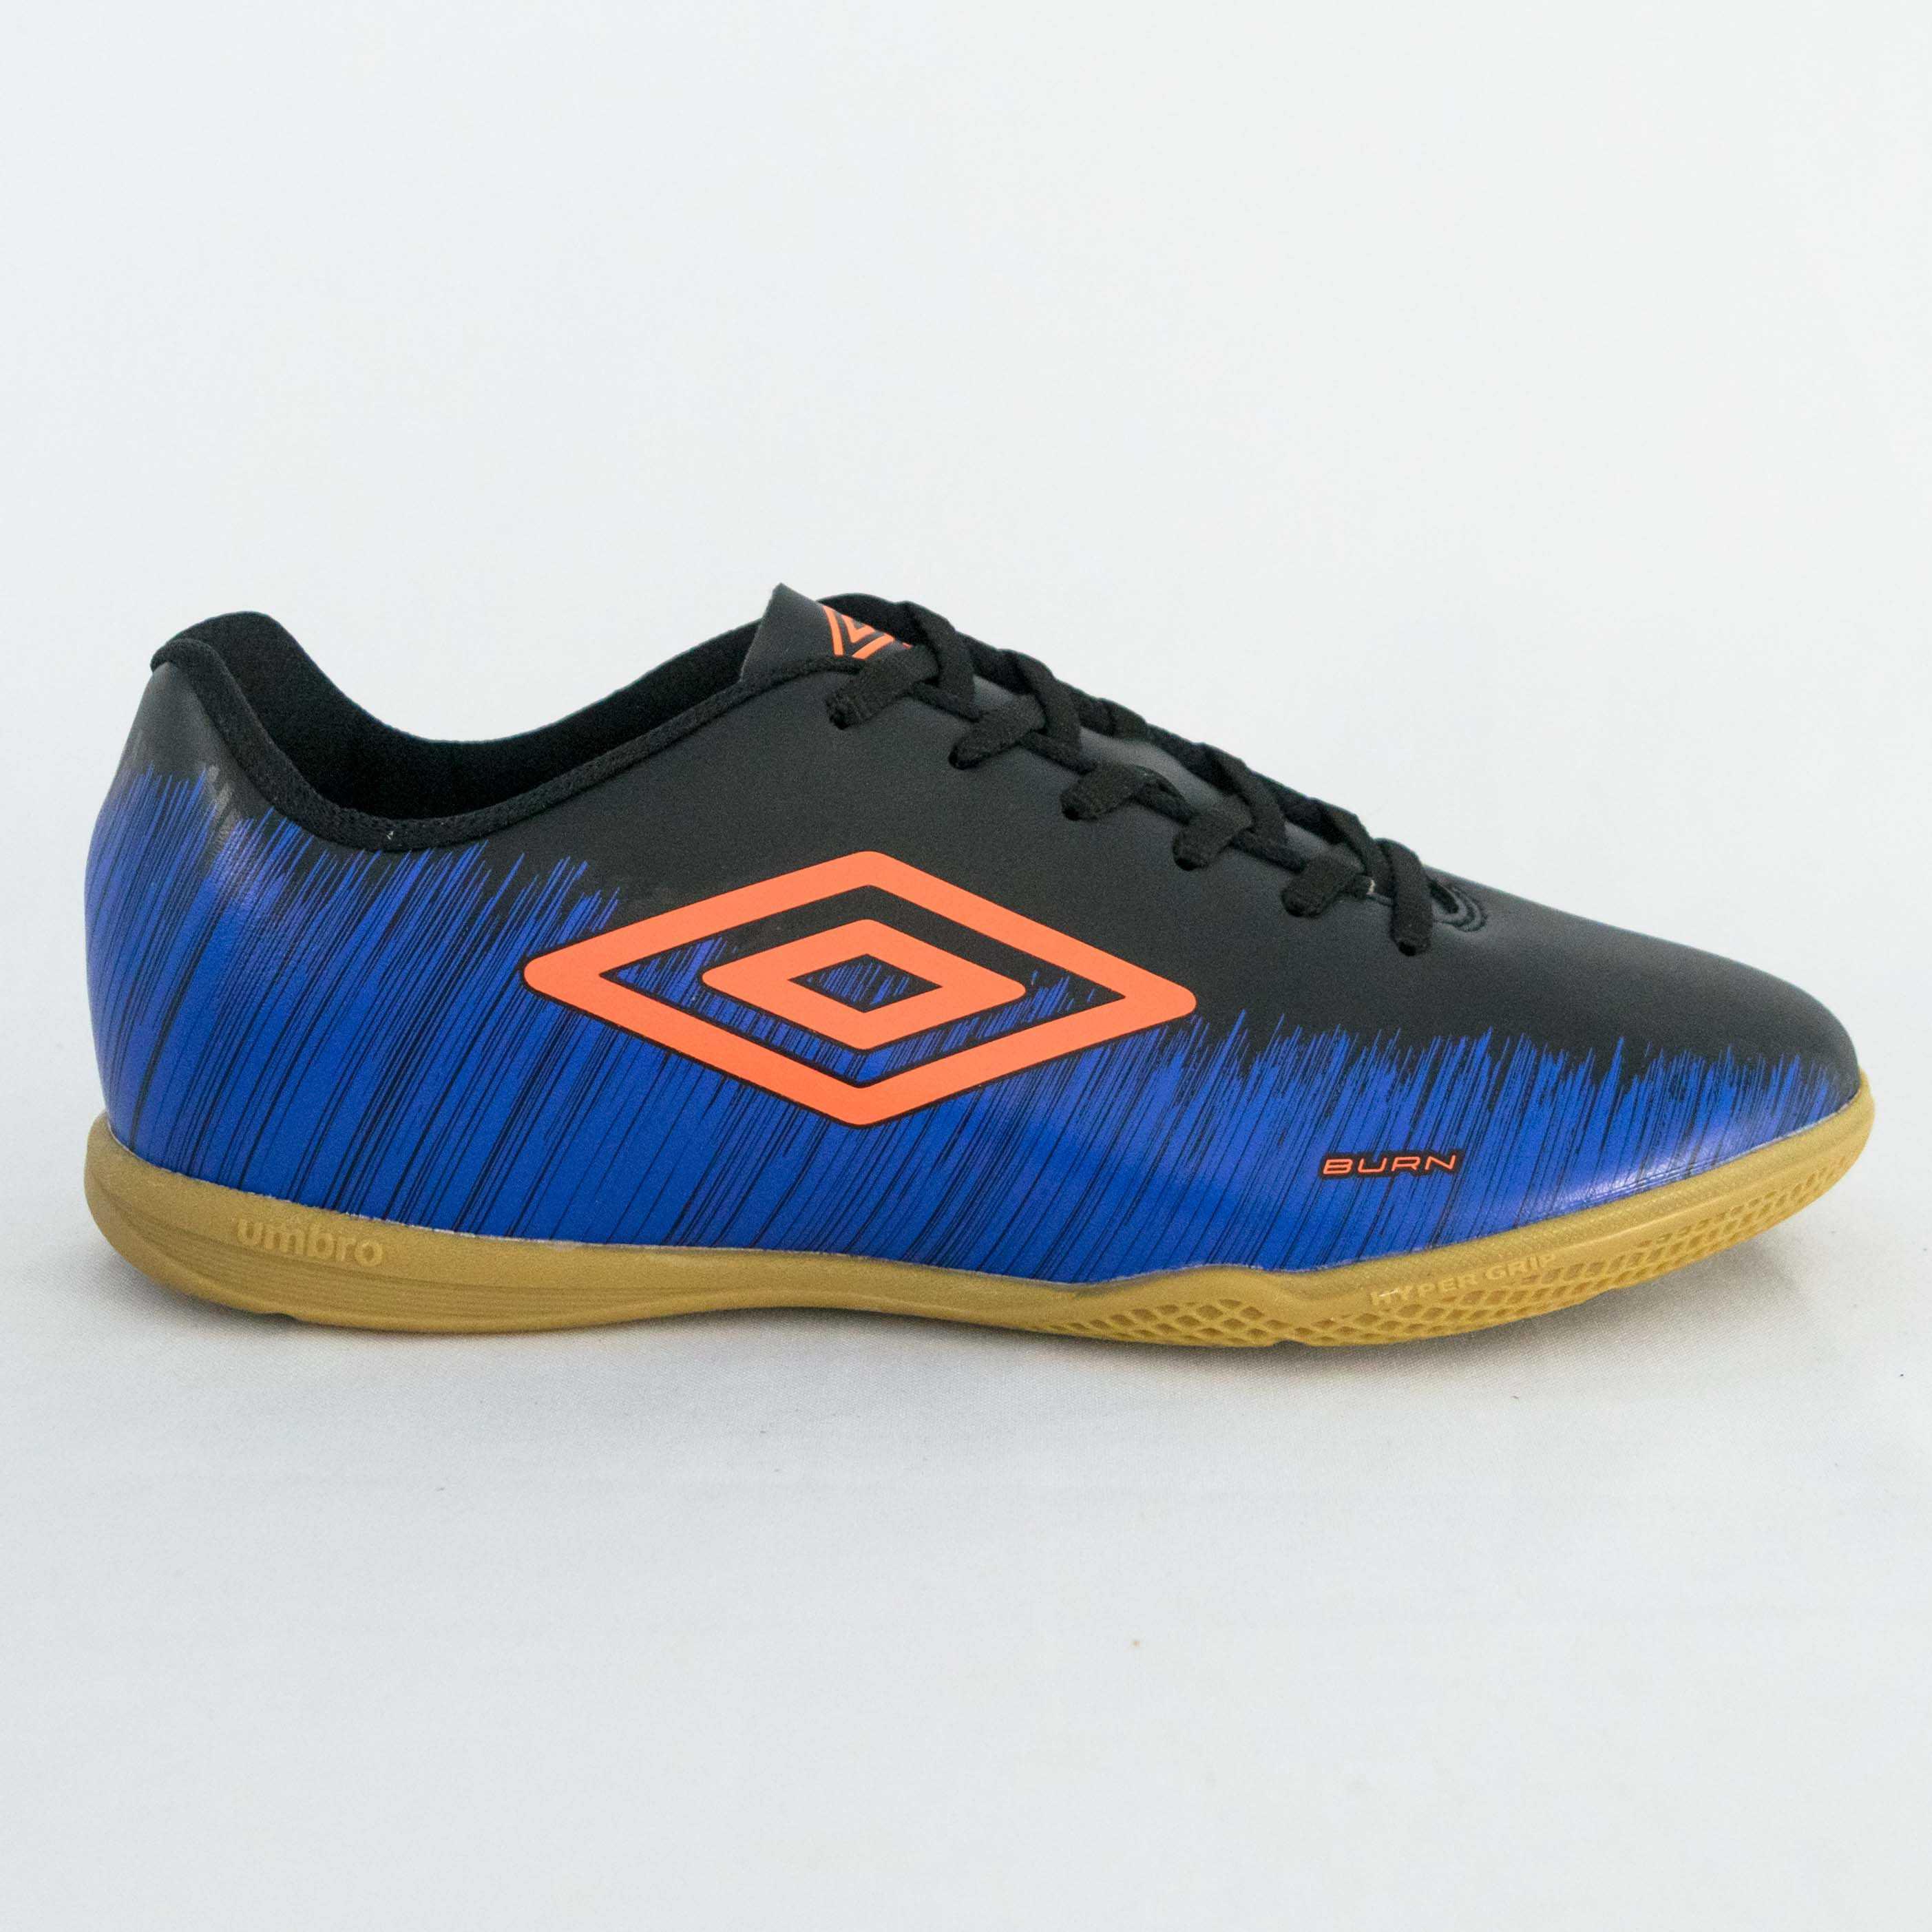 Tênis Umbro 883052 Futsal Burn Azul